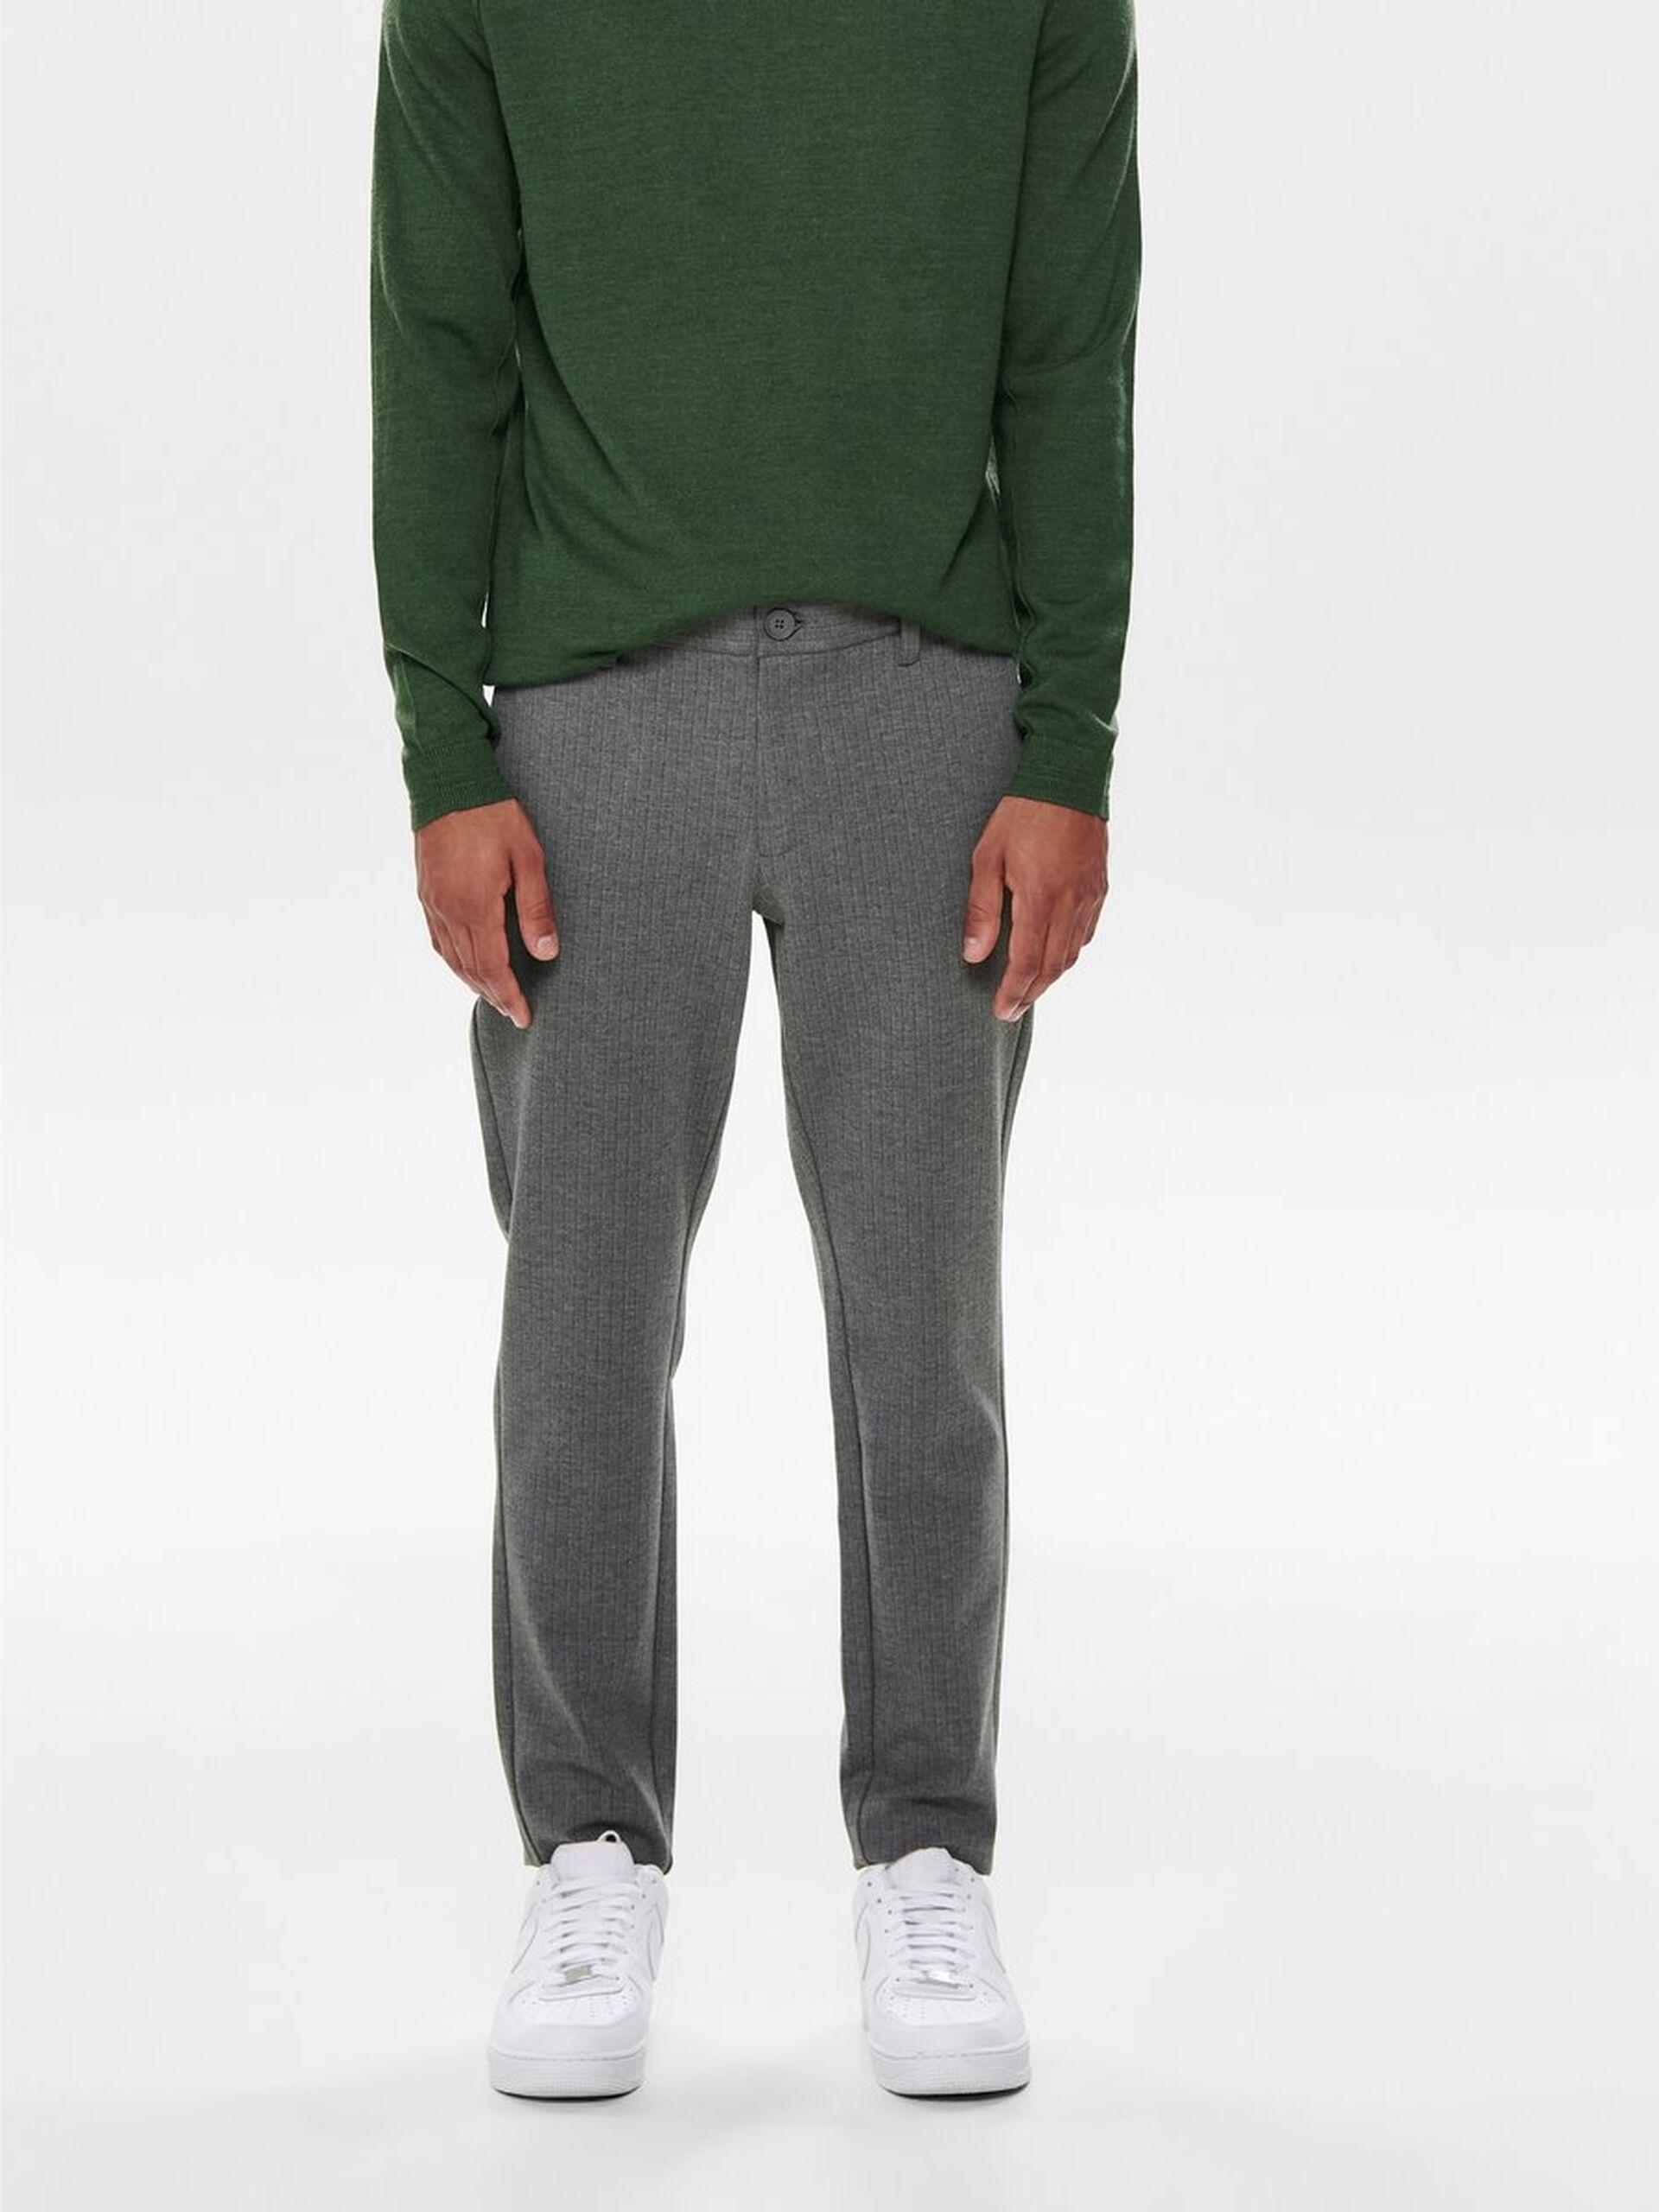 Performance Pants, Only & Sons, Mark striped chinos, medium grey melange, 33/32